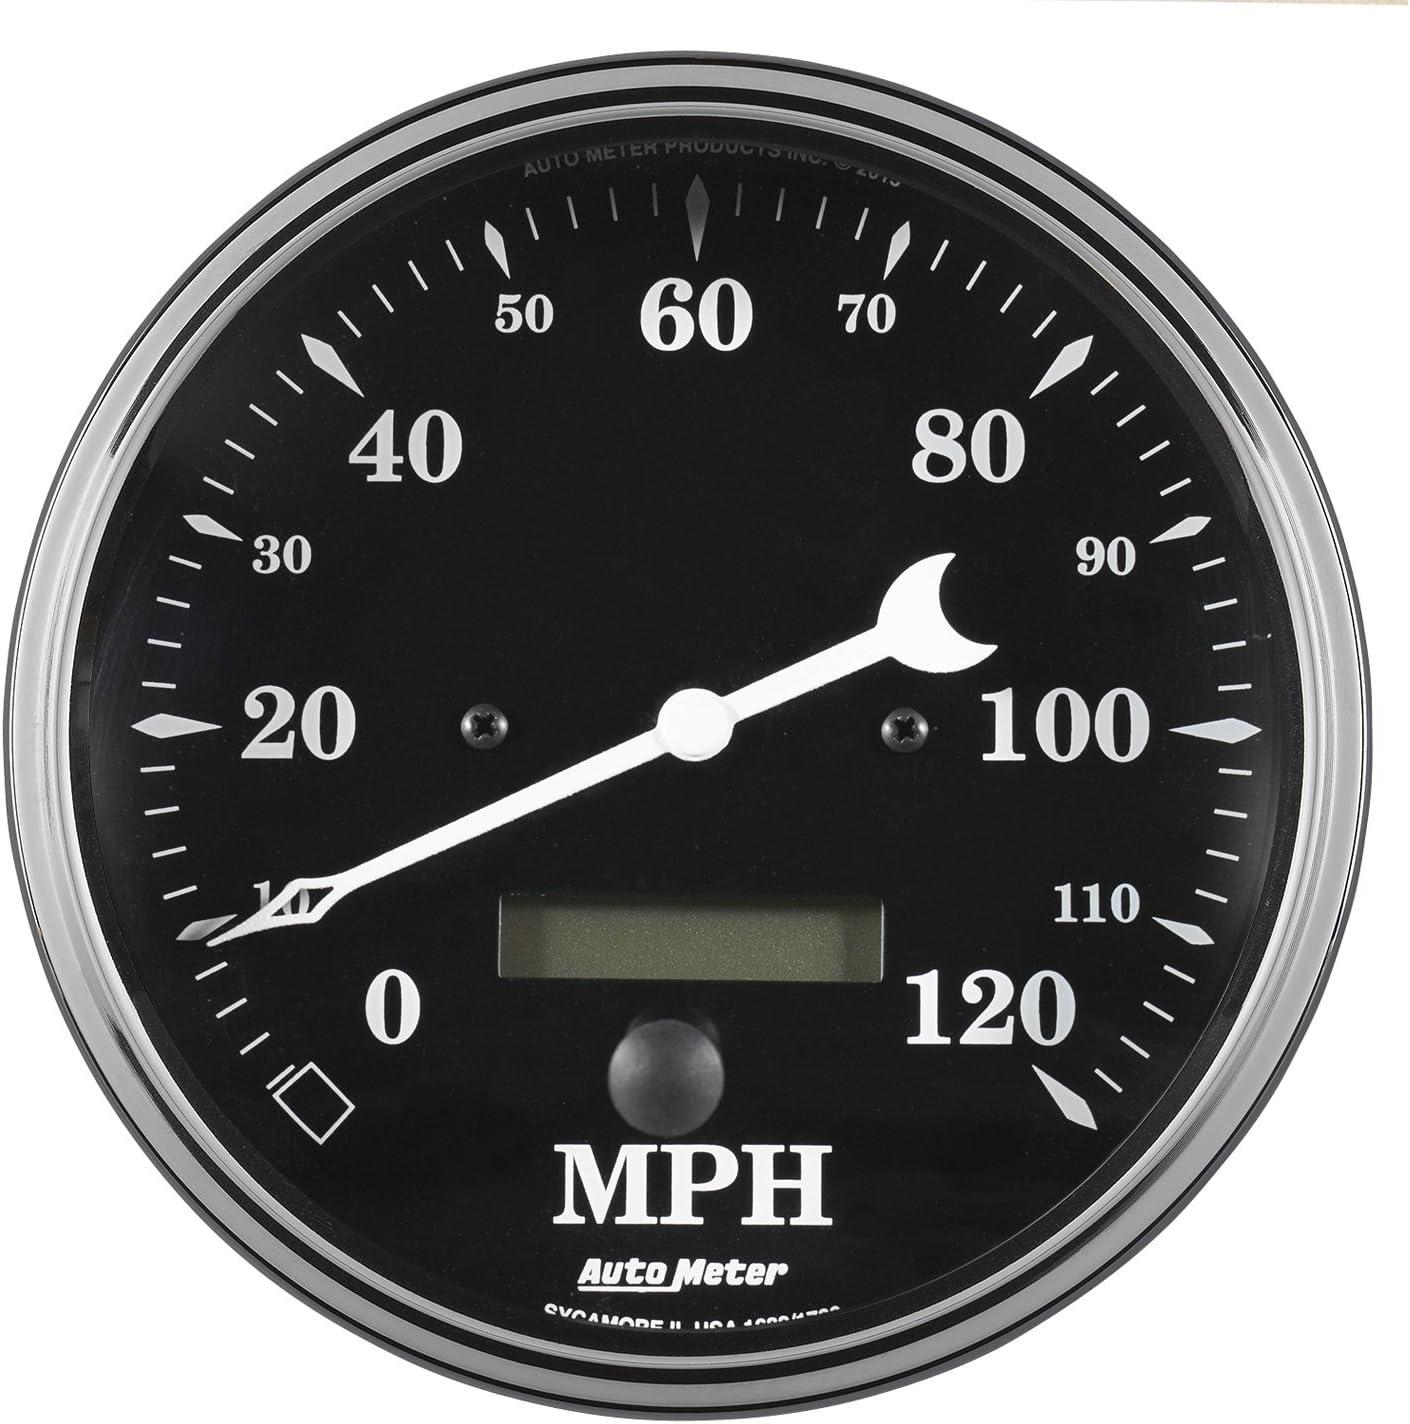 W//LCD Odo Prog Speedo Elec Auto Meter AutoMeter 1780 Gauge Old TYME Black 120Mph 3 3//8